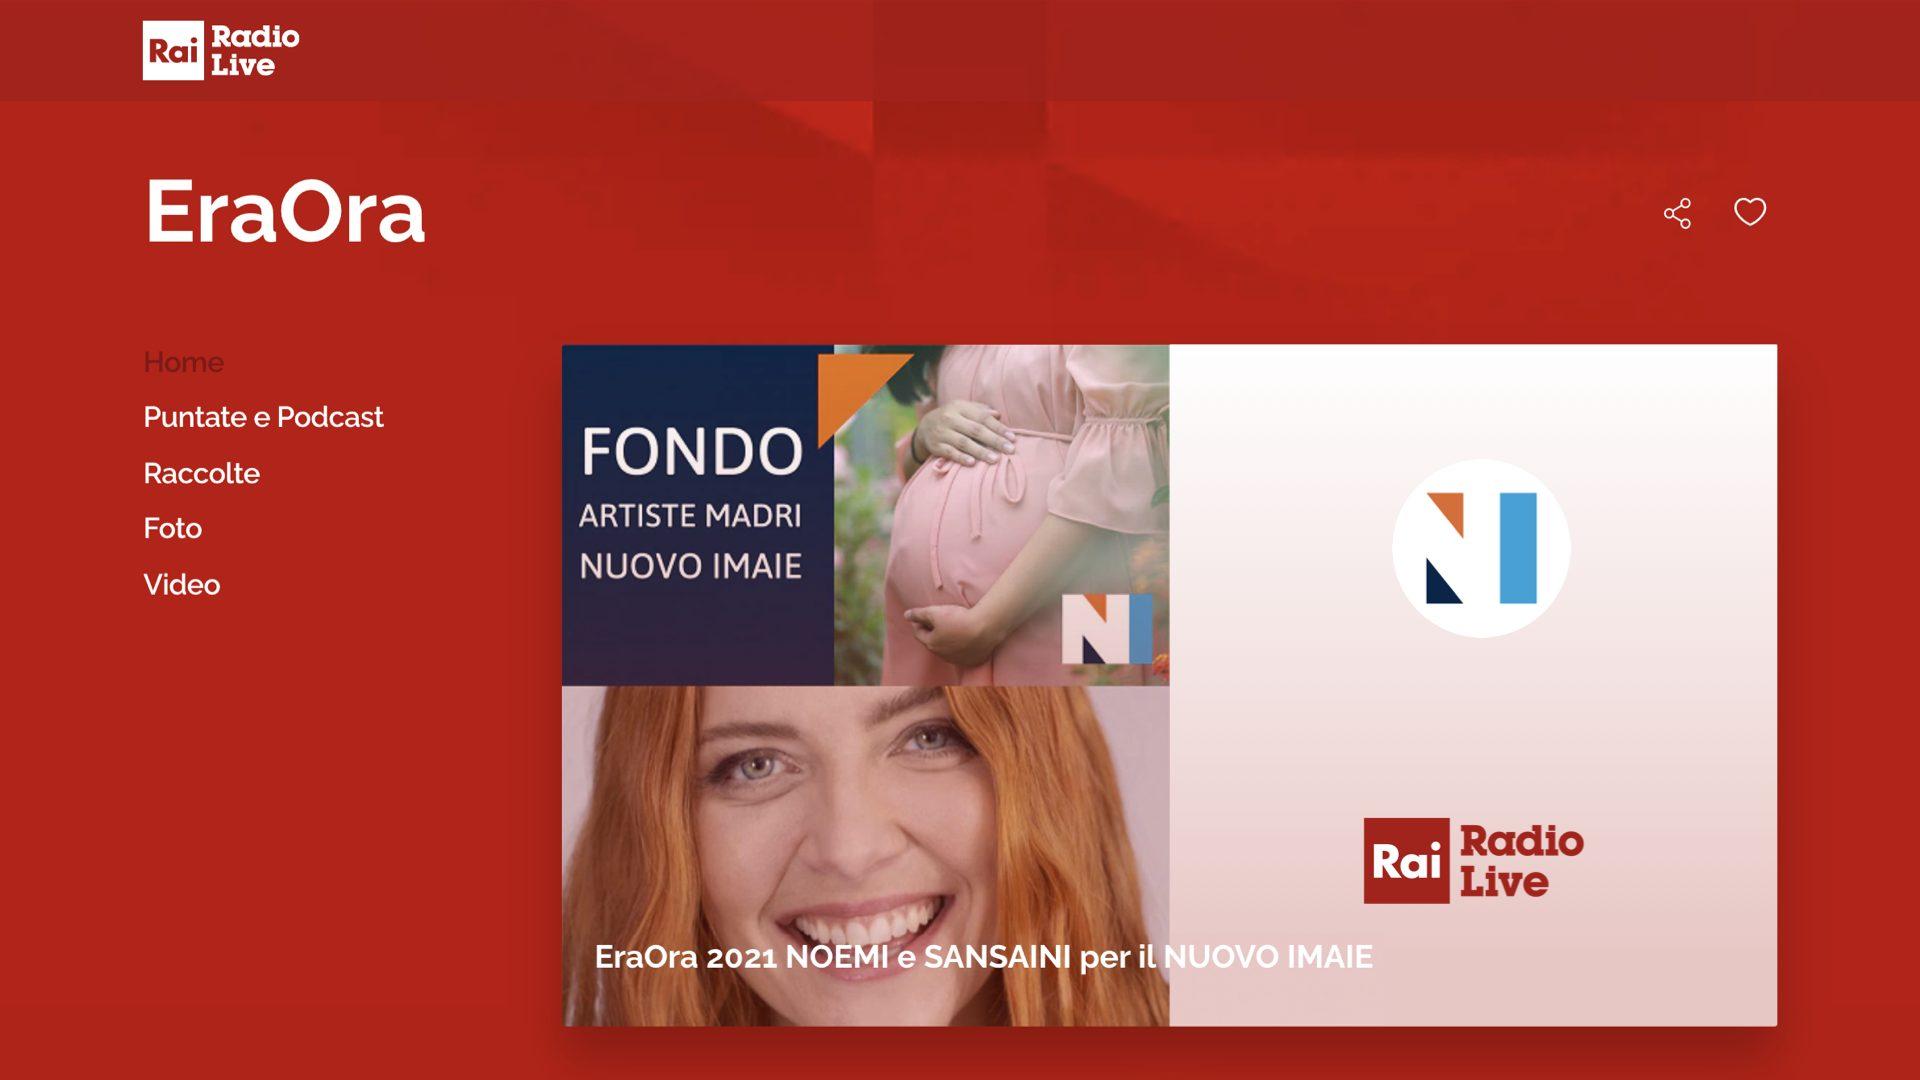 Donne, Musica e Diritti degli Artisti: NUOVO IMAIE su Raiplay Radio